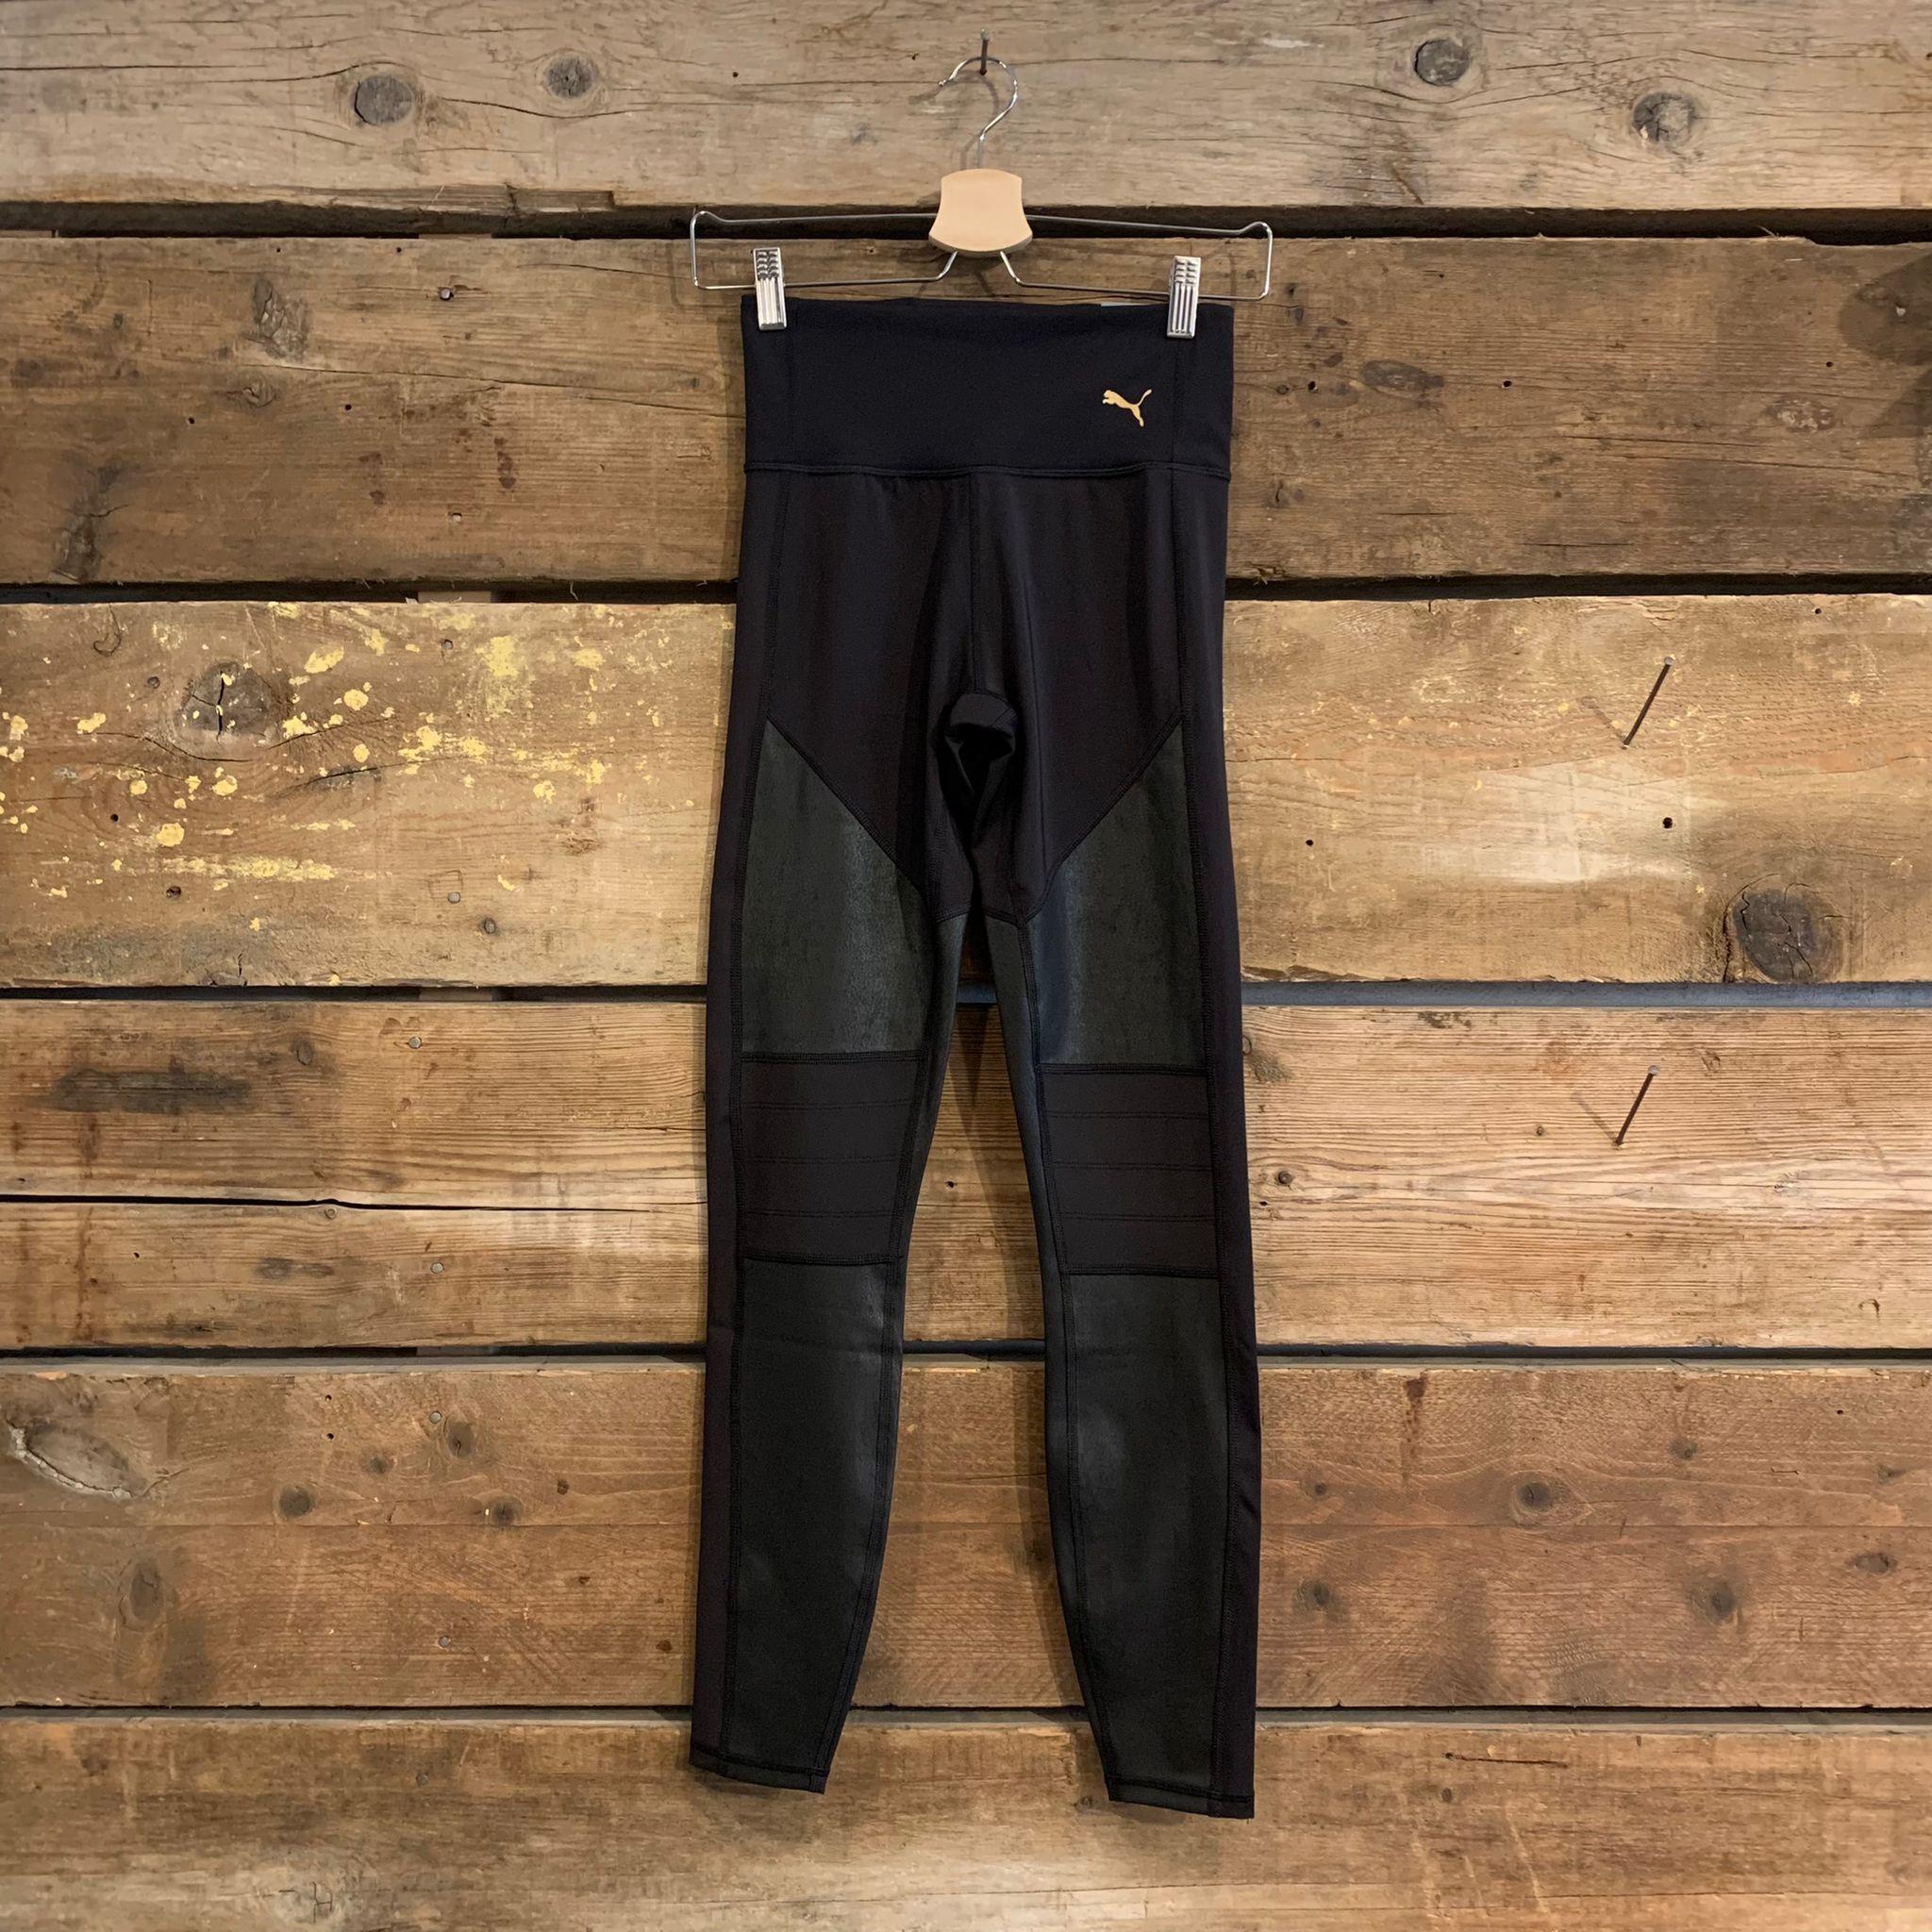 Leggings Puma Moto High Waist Full Tight Black